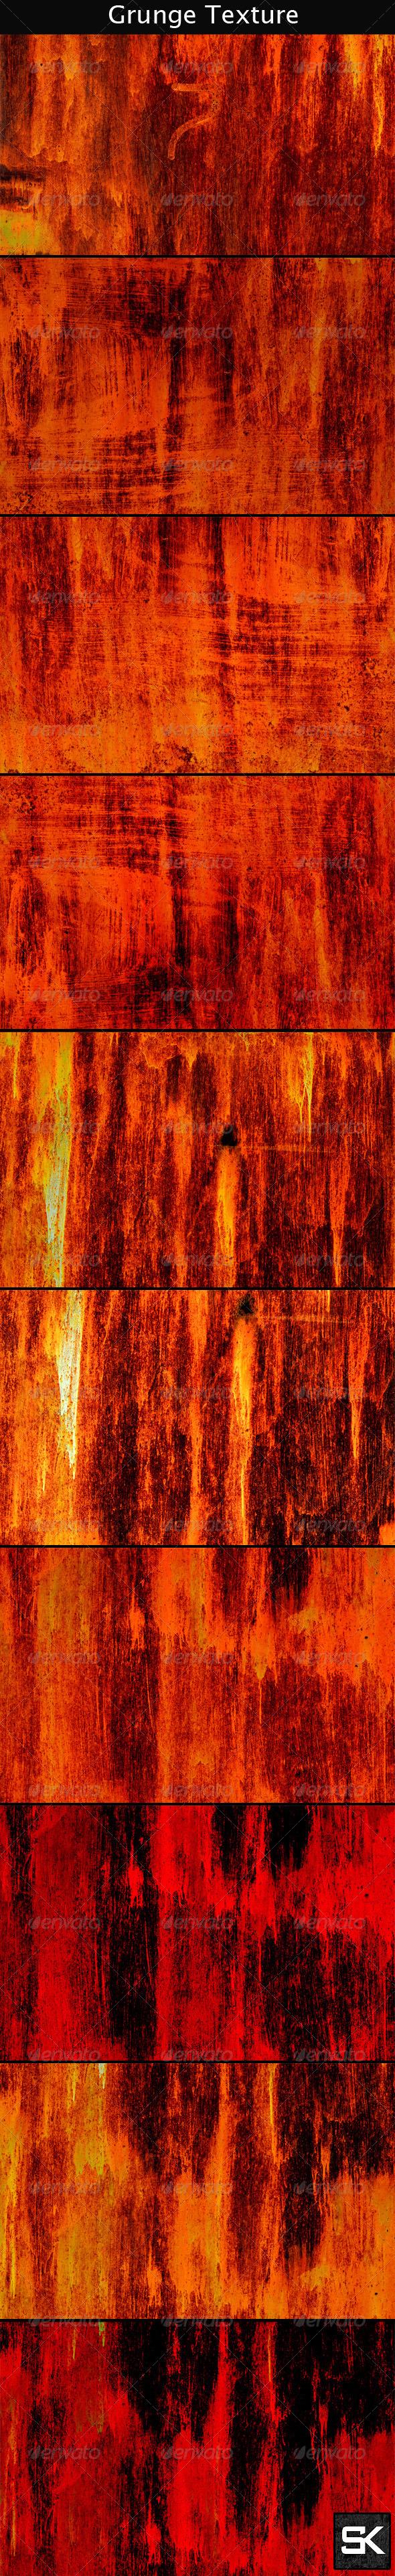 GraphicRiver Grunge Texture 7959934